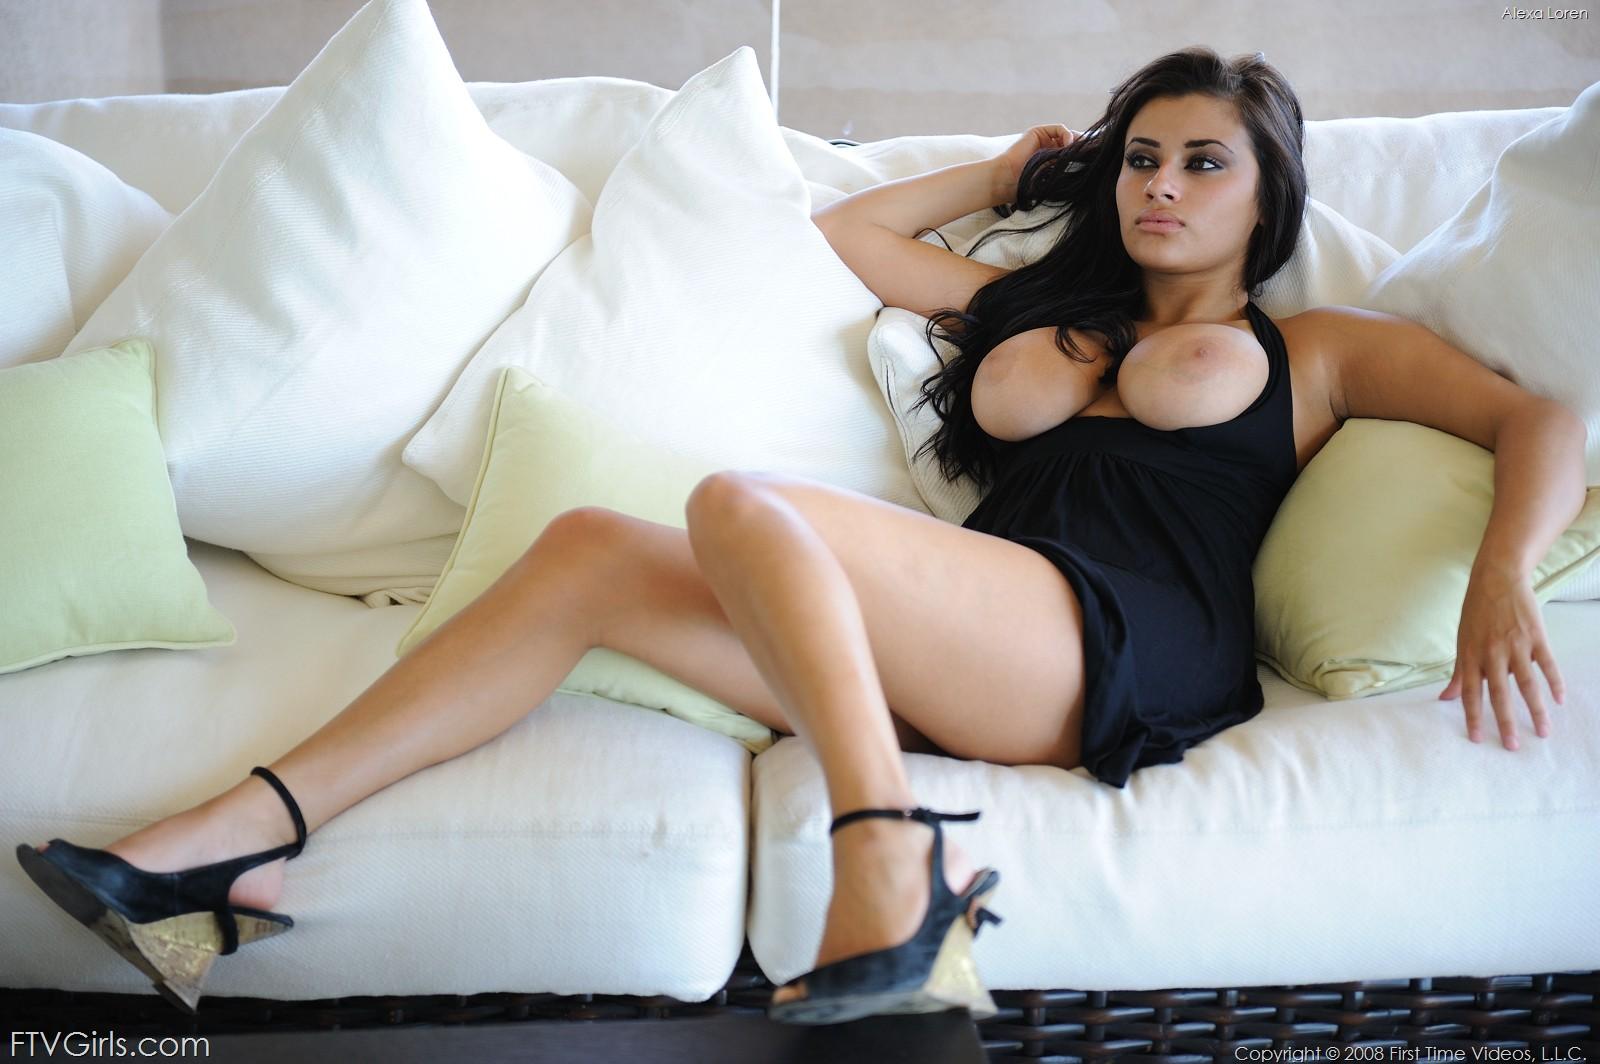 Loren natural alexa boobs